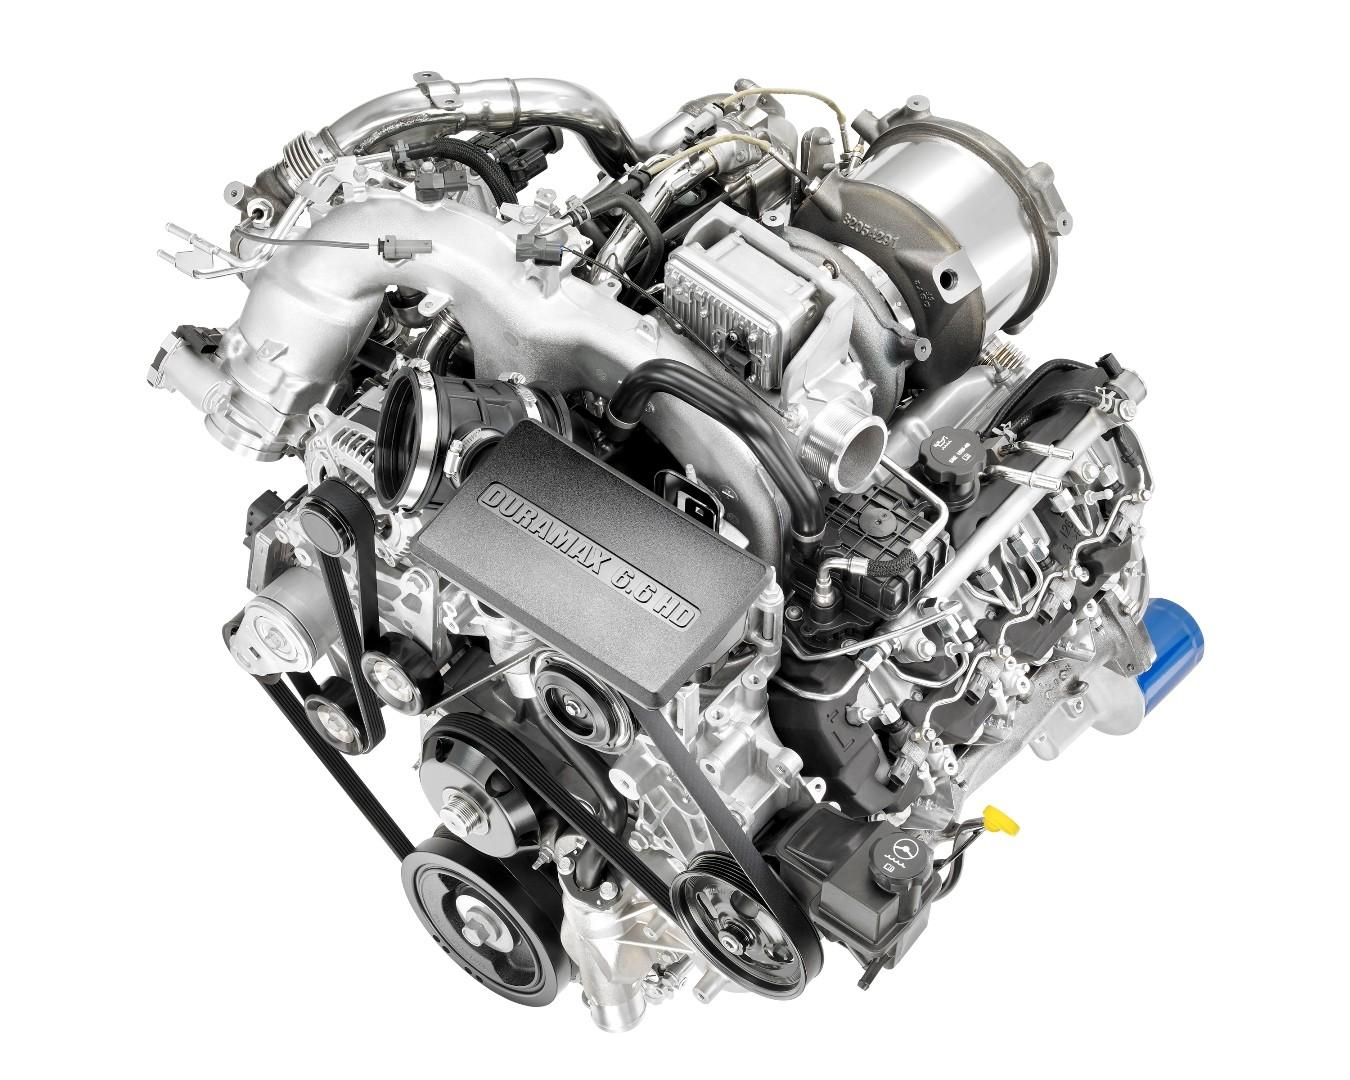 For A Nissan Truck Wiring Diagram L5p Duramax Diesel Is Go In 2017 Chevrolet Silverado Hd